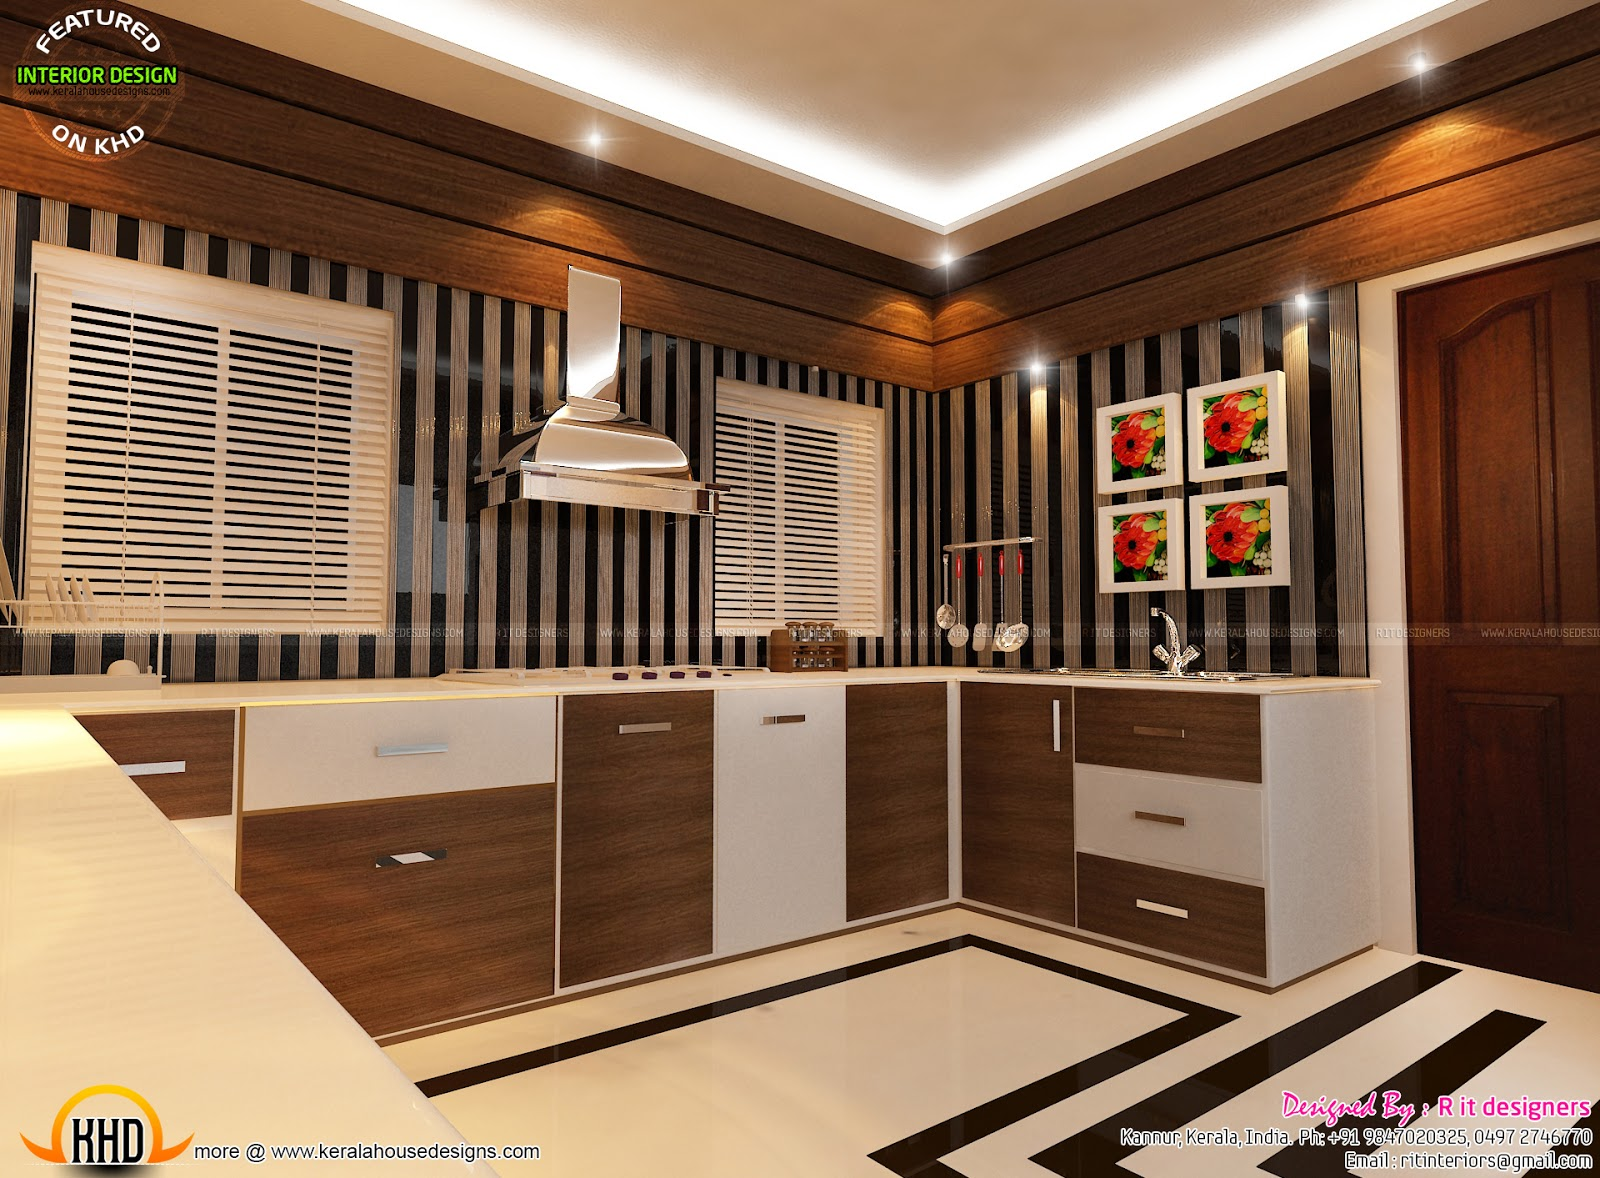 modular kitchen bedroom staircase interior kerala home design kitchen interiors modular kitchens chennai chennai interior